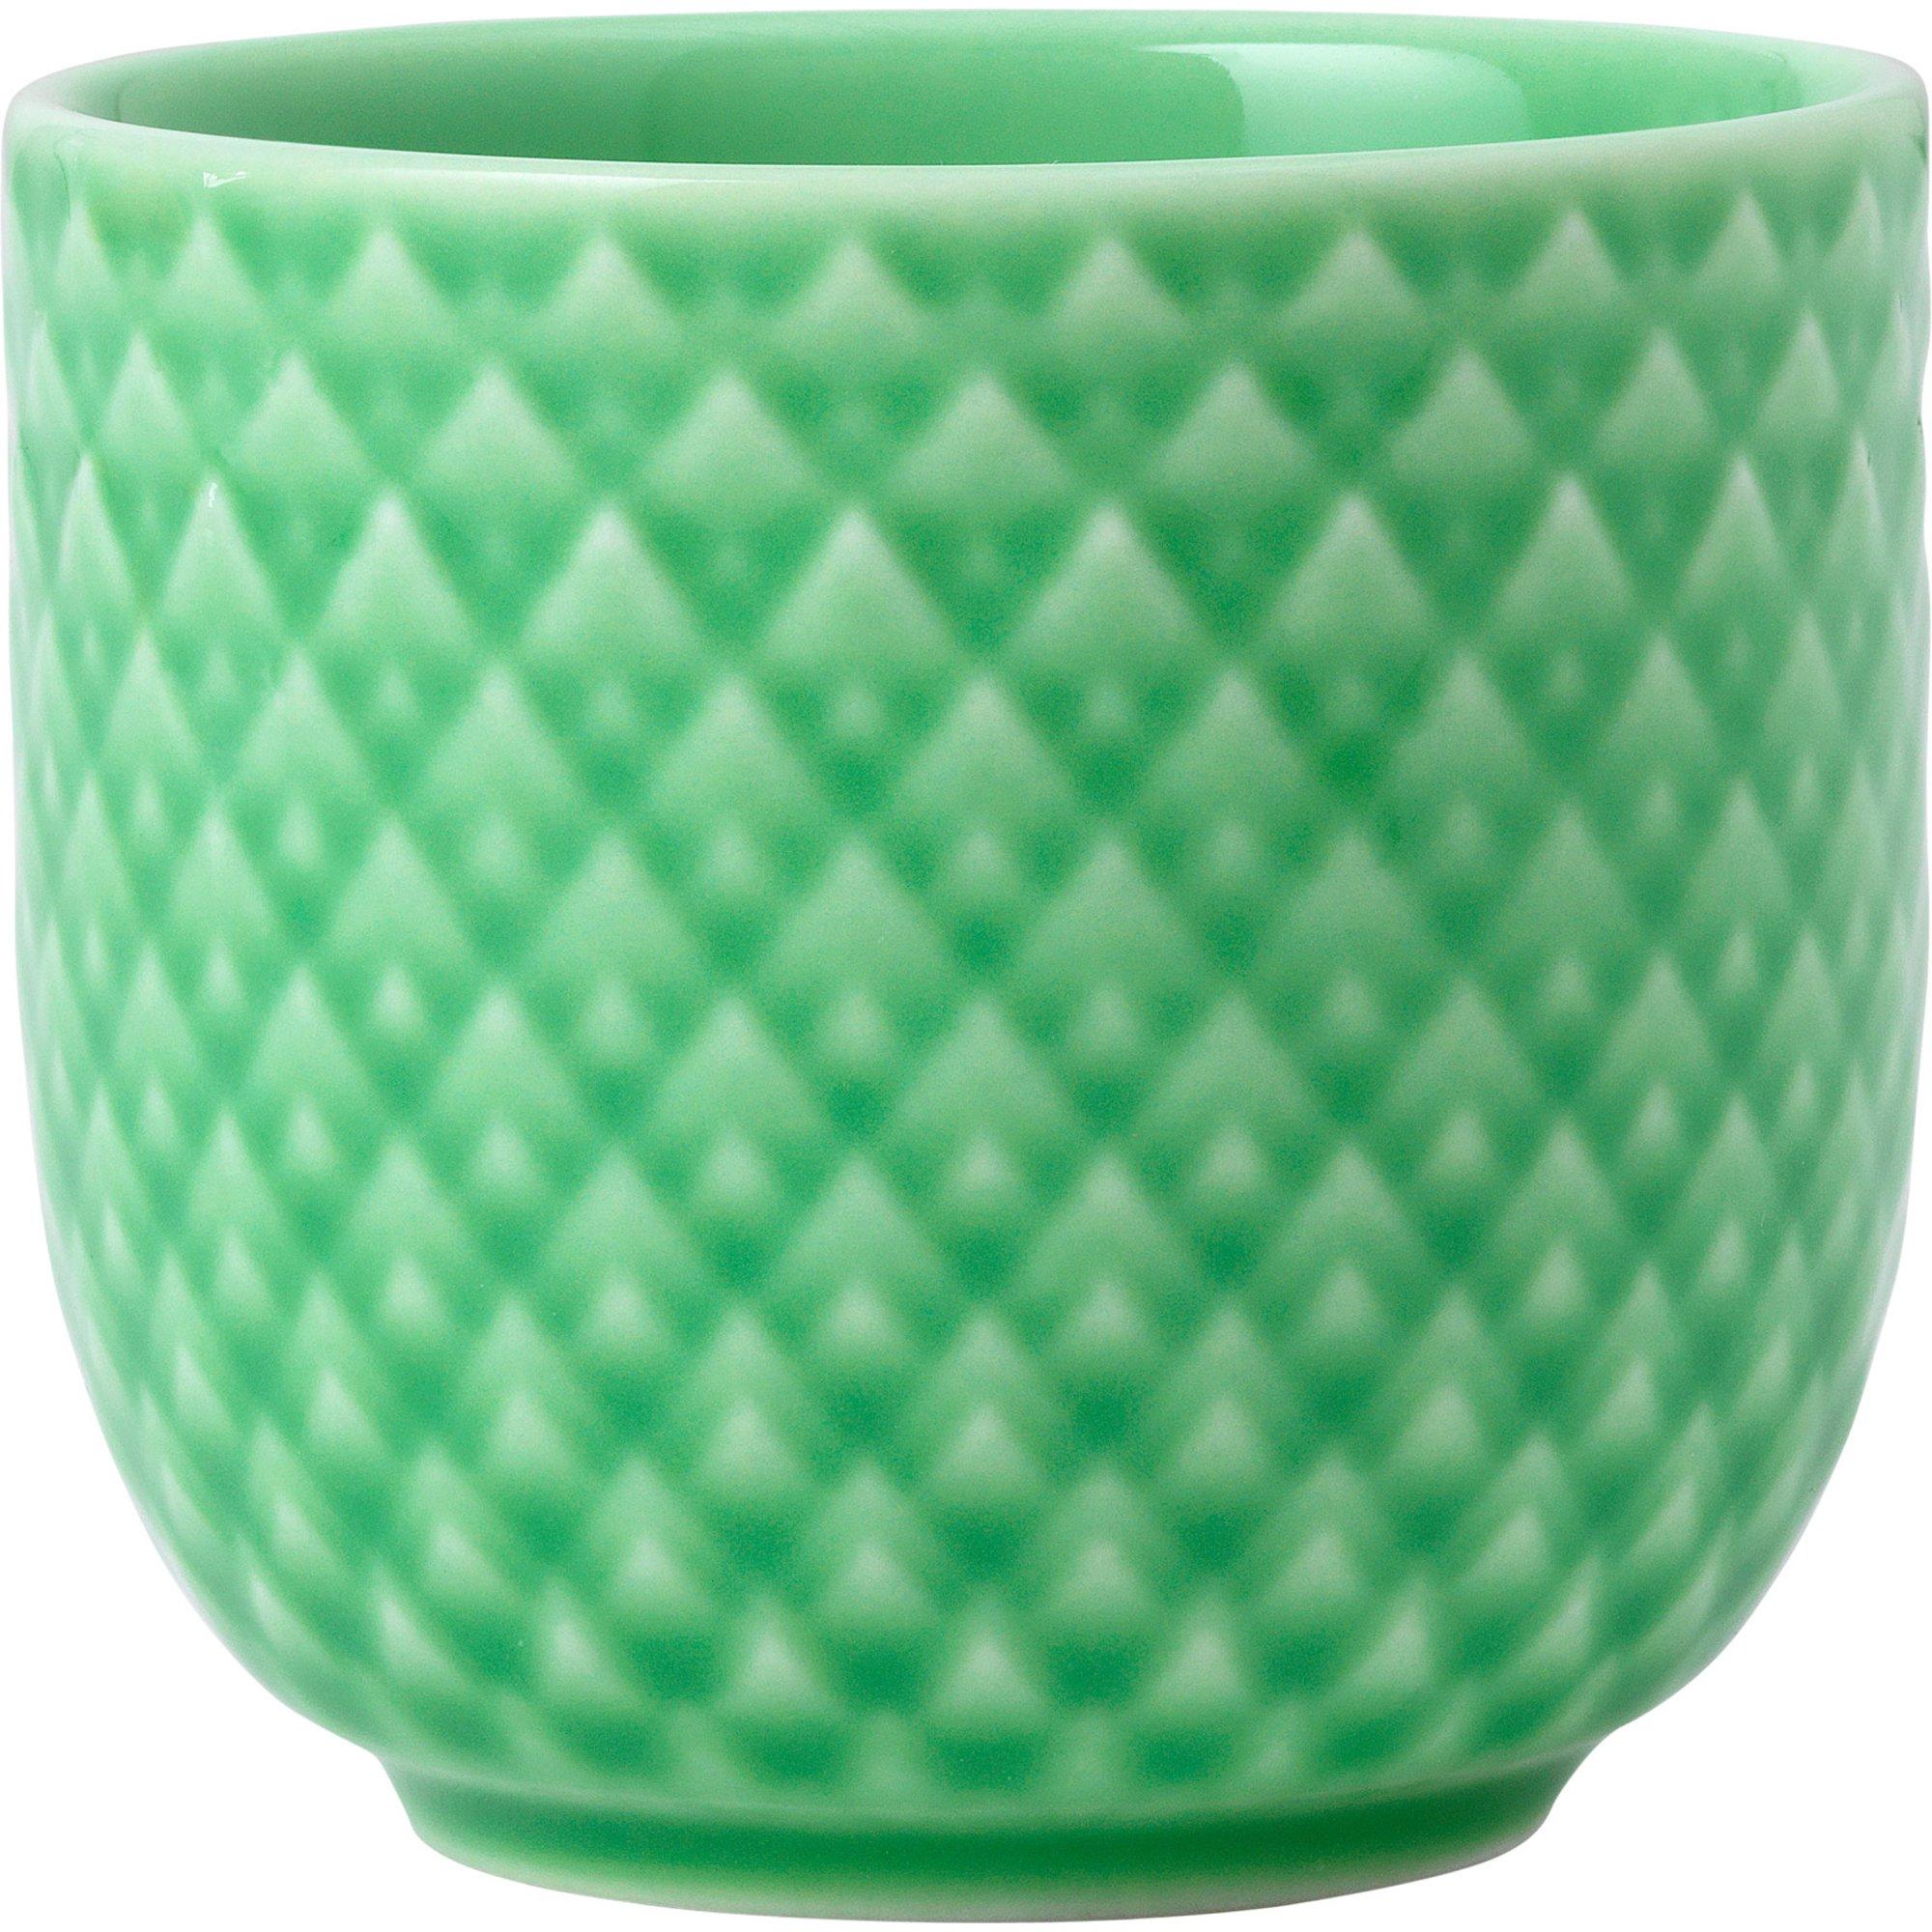 Lyngby Porcelæn Rhombe Color äggkopp 5 cm. Grön